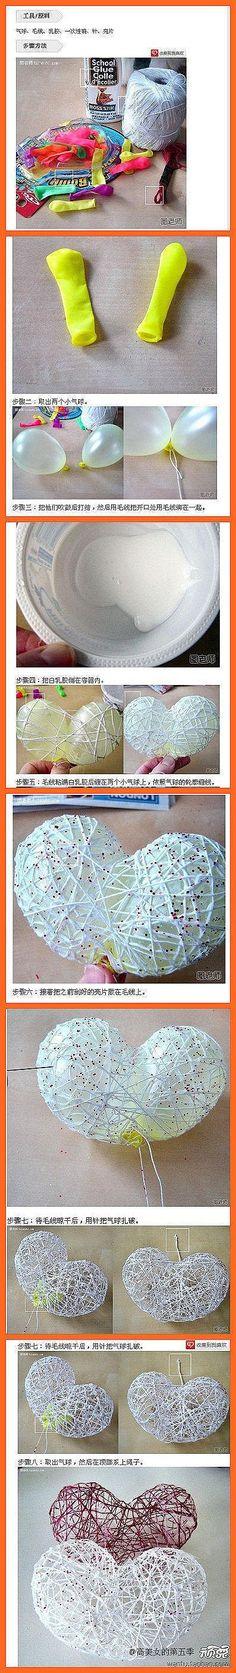 DIY Yarn Heart Ornament DIY Yarn Heart Ornament